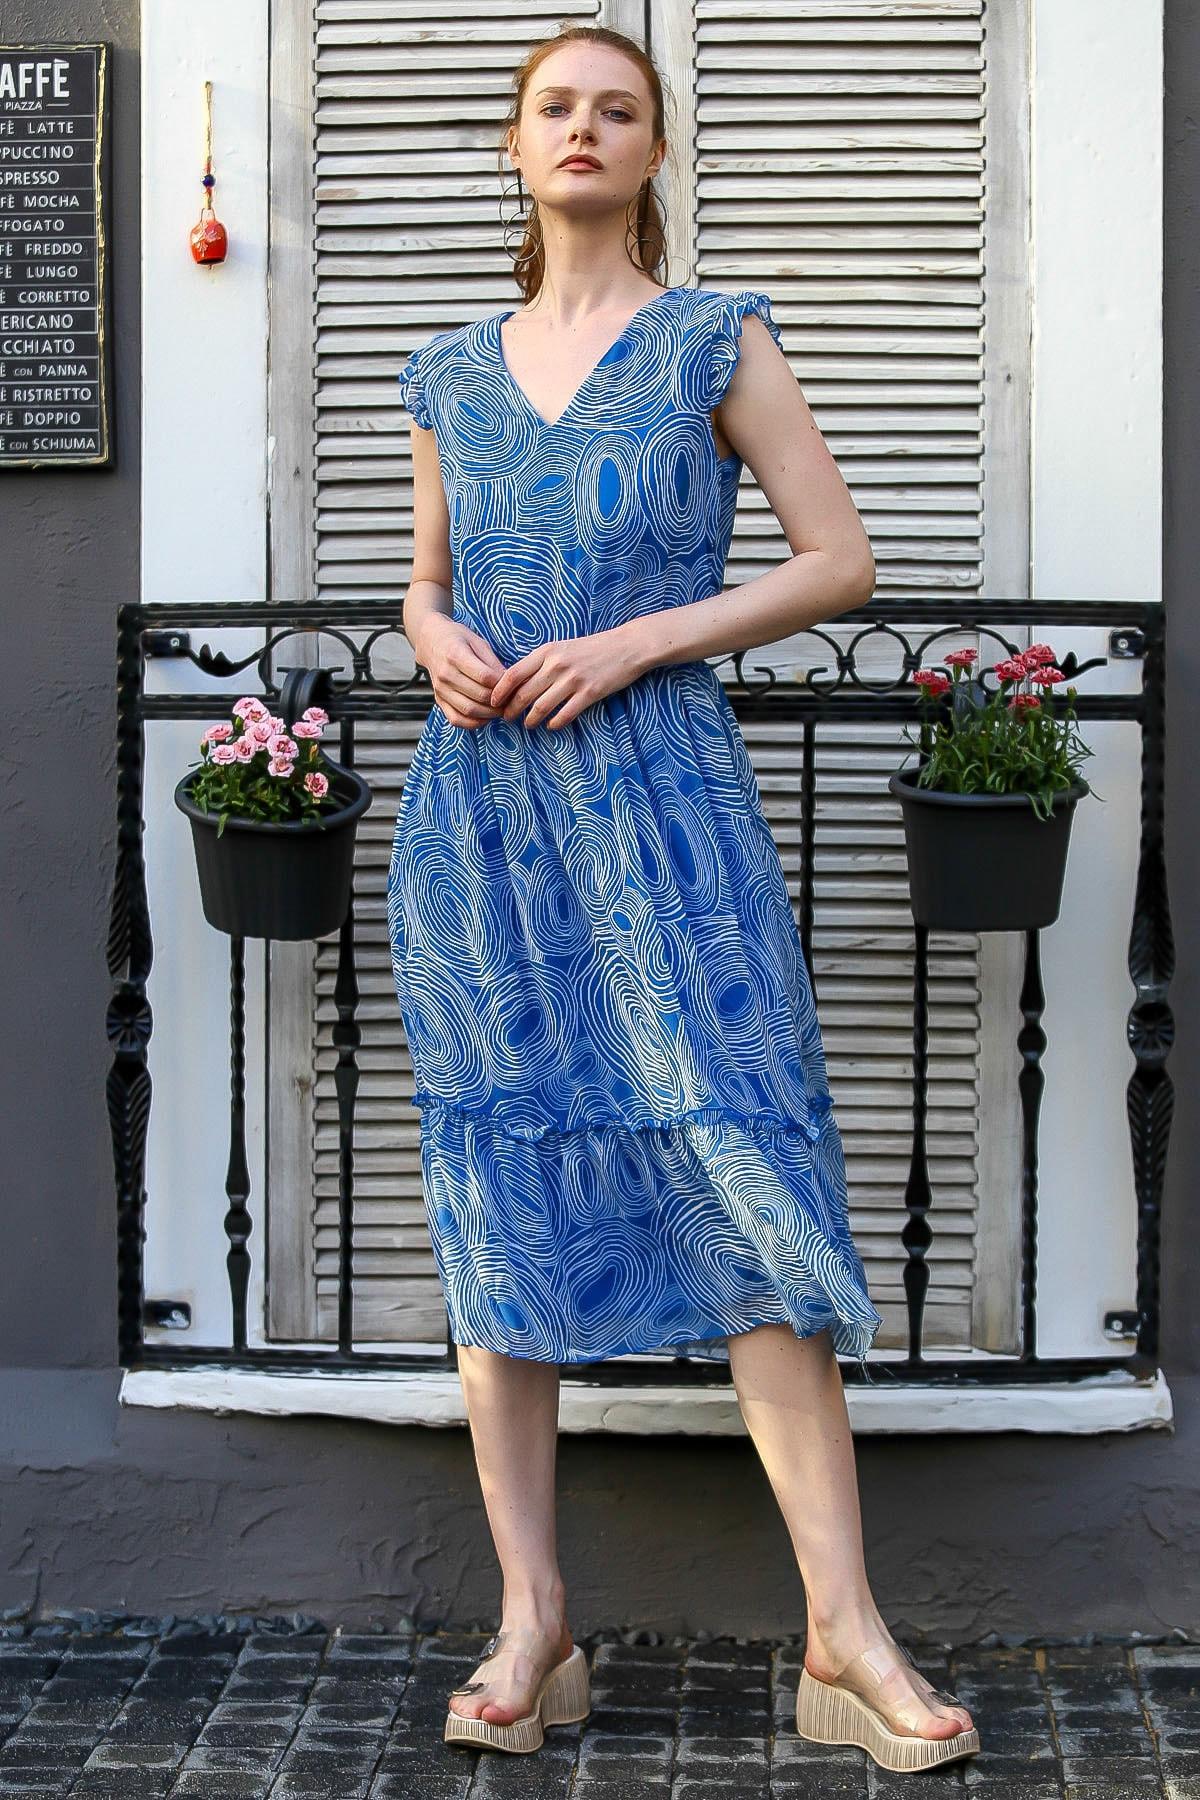 Chiccy Kadın Mavi V Yaka Kolsuz Çizgi Desenli Astarlı Şifon Elbise M10160000El94790